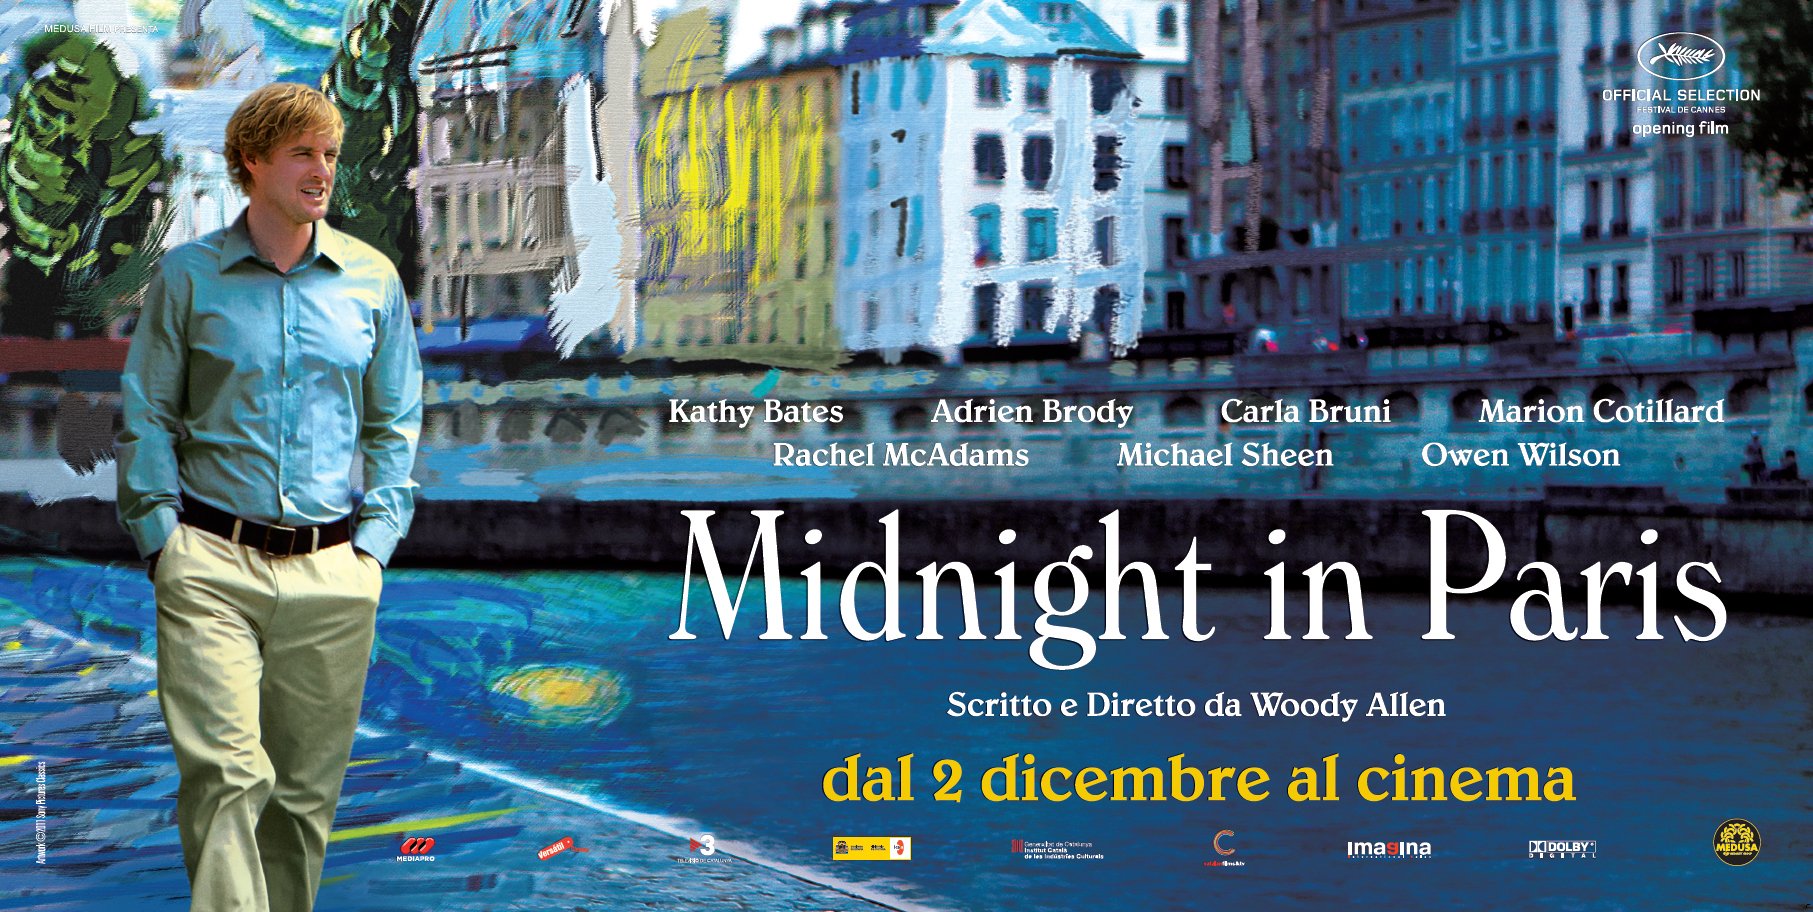 Owen Wilson Midnight-in-paris-teaser-poster-orizzontale-italia-1